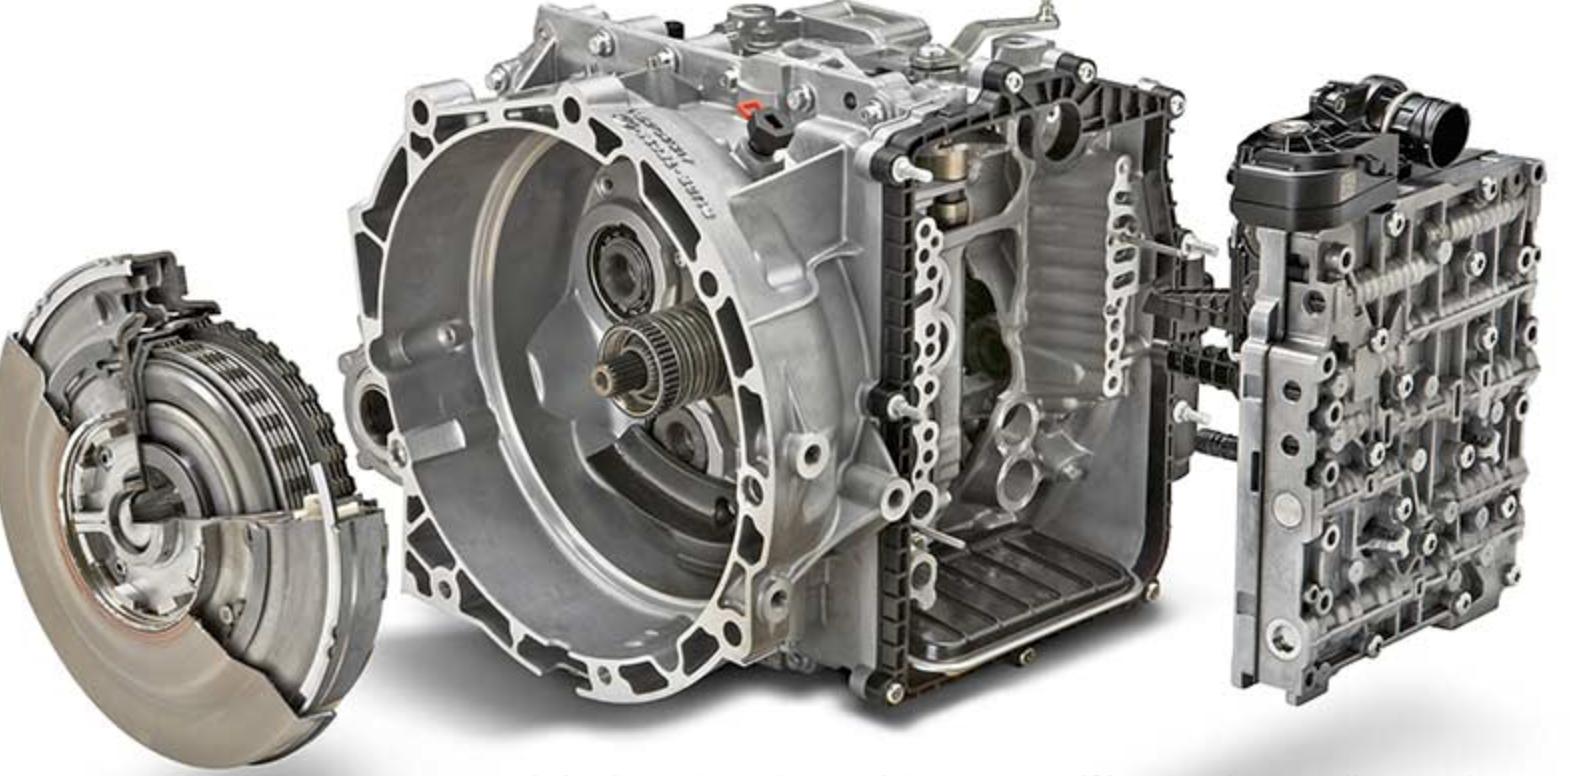 Ford Powershift transmission Fault